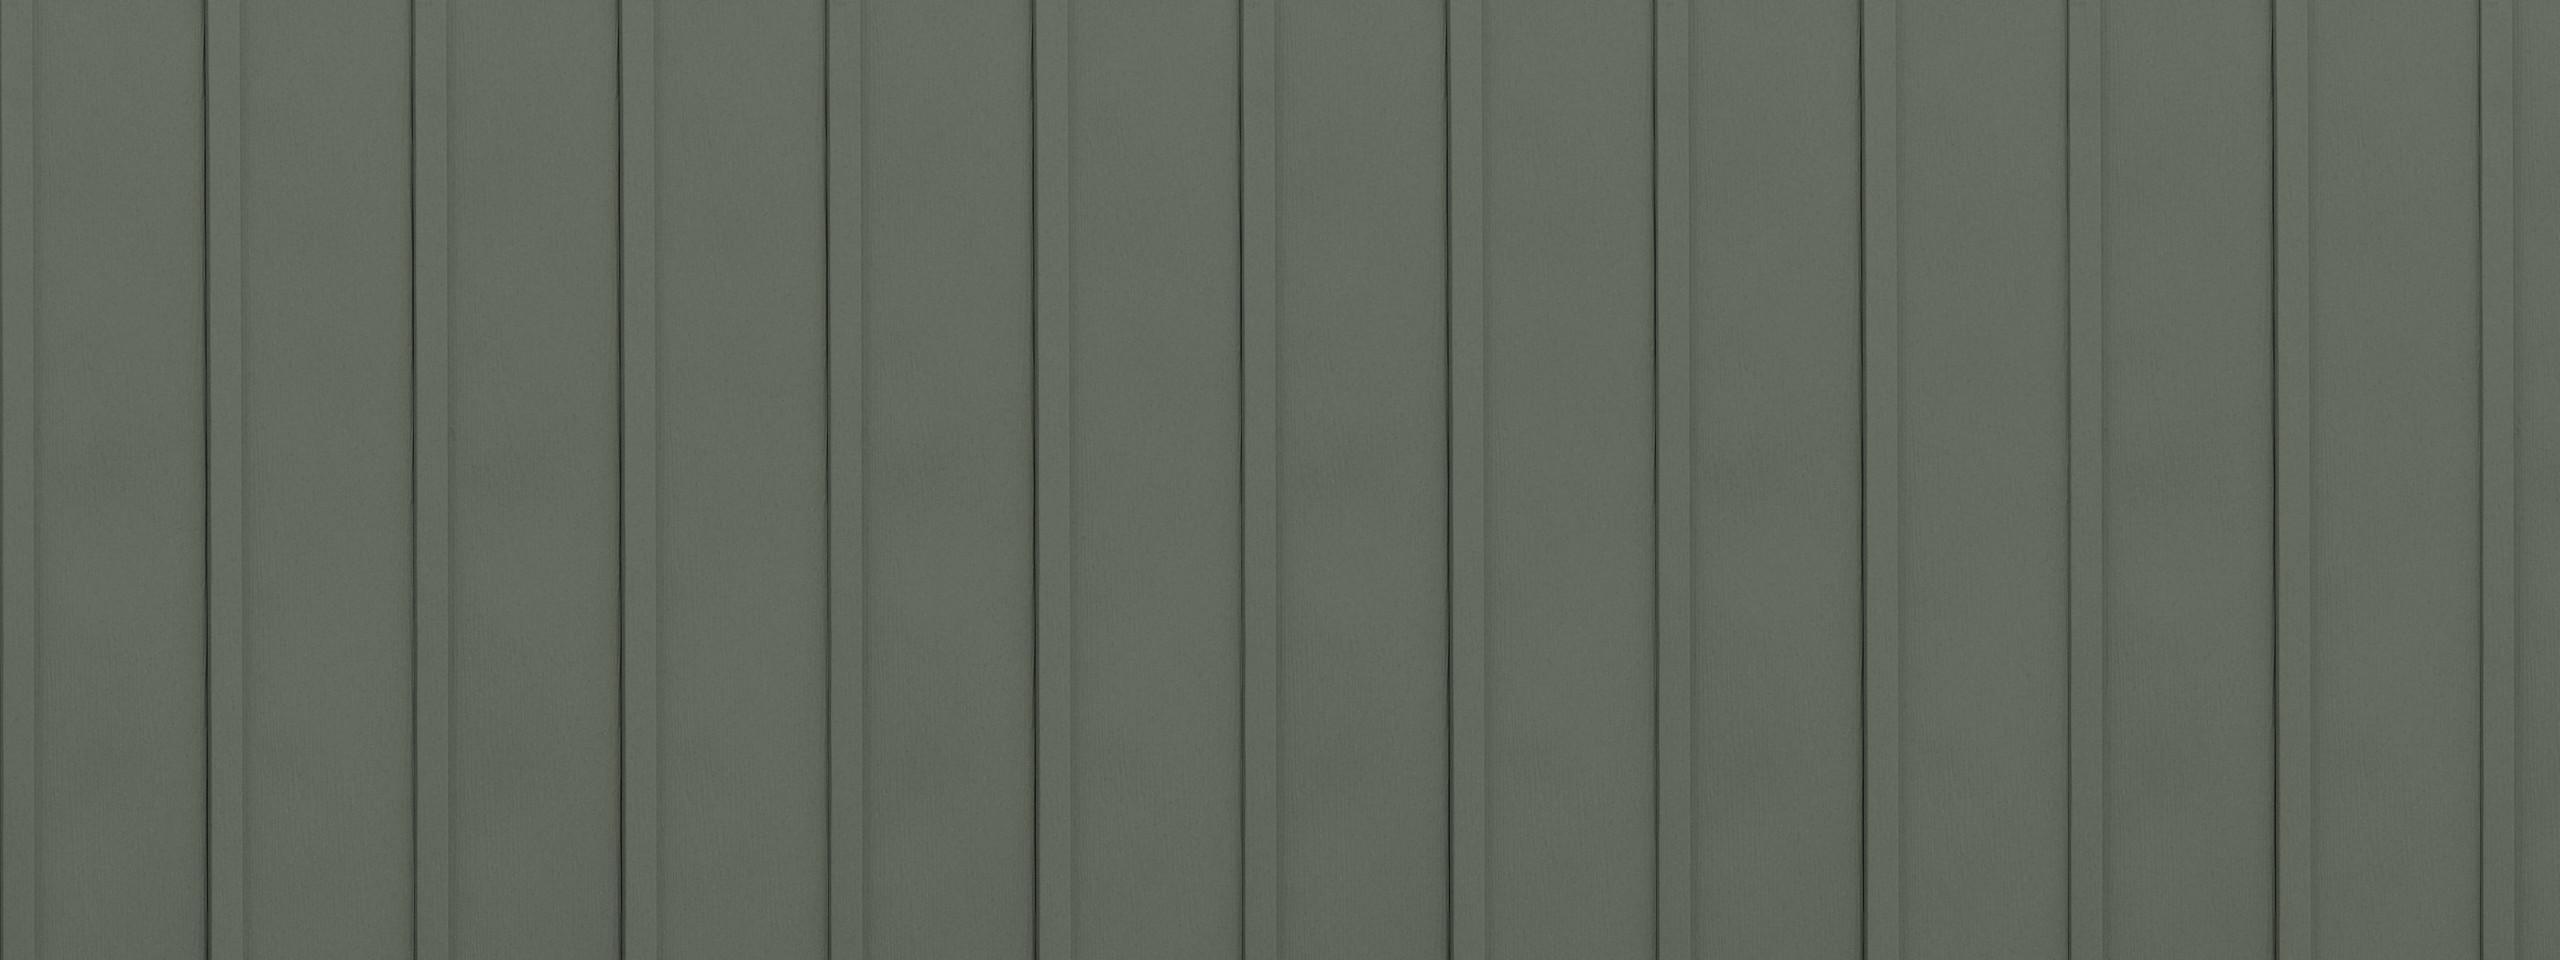 Entex vertical sage board and batten steel siding